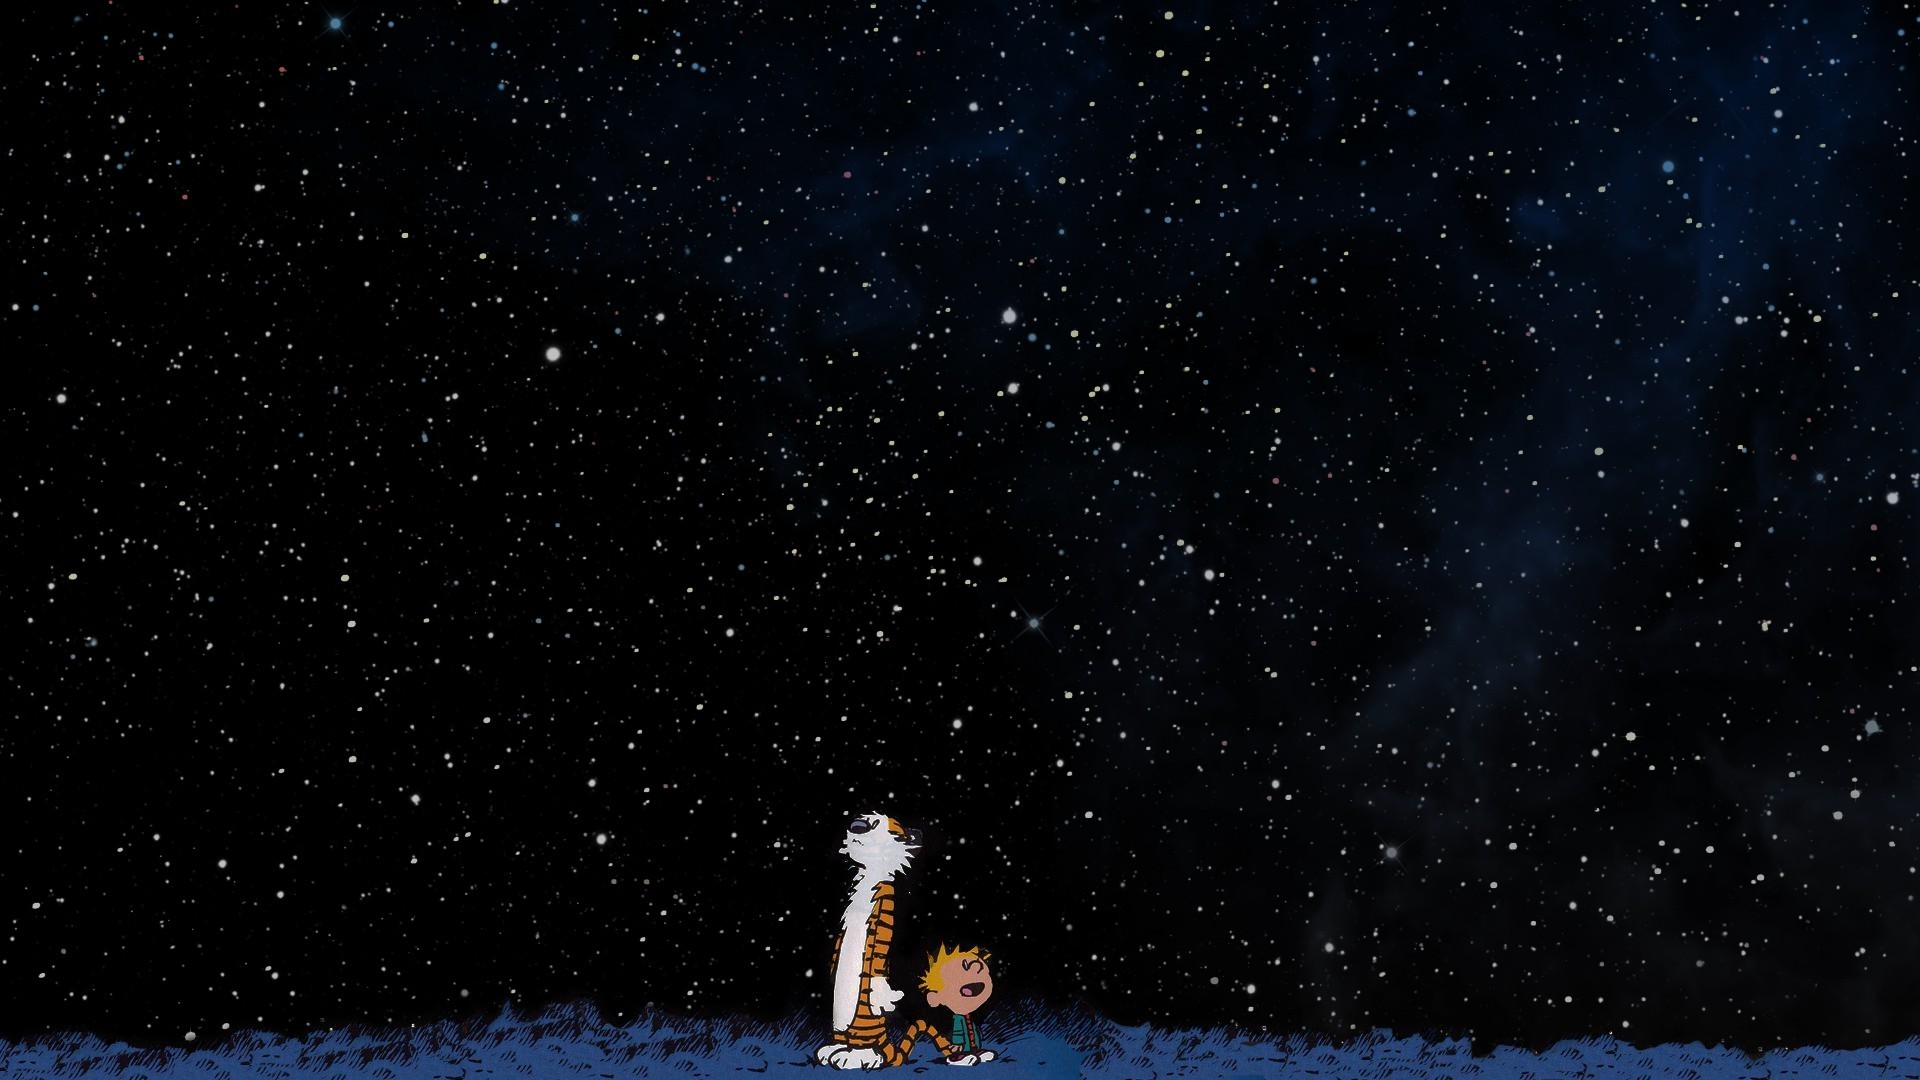 Free Download Calvin And Hobbes Space Stars Wallpapers Hd Desktop